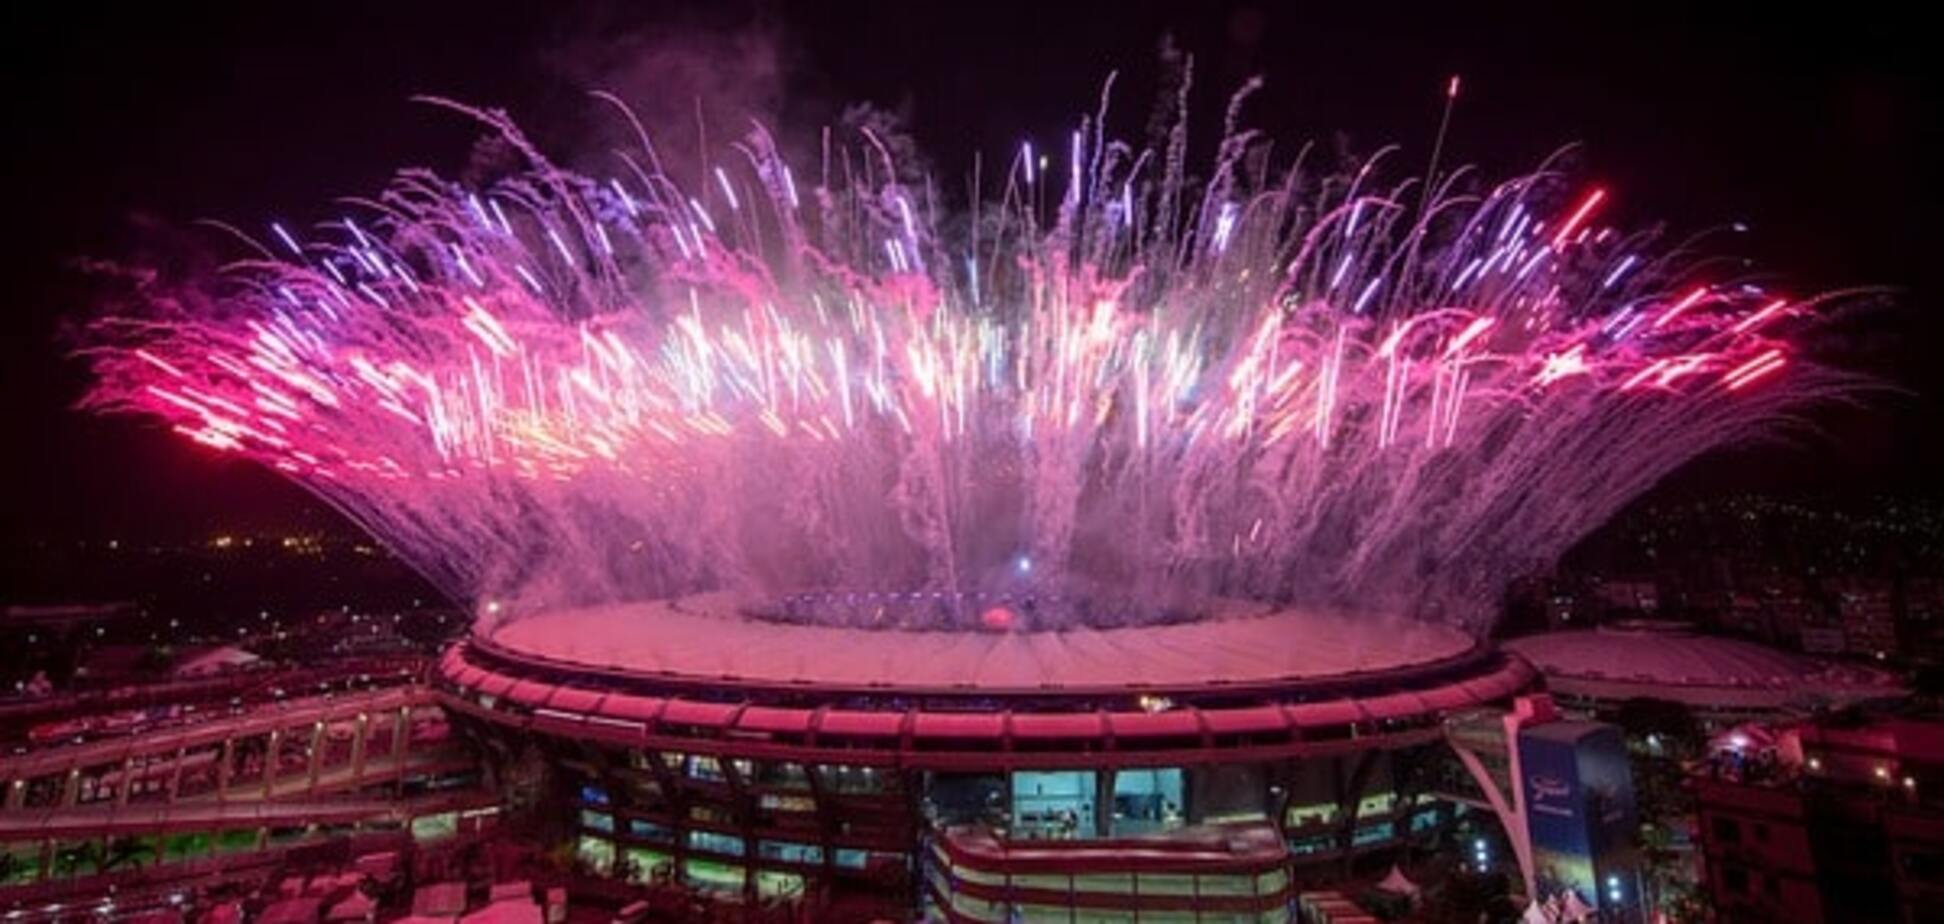 церемония открытия Олимпиалы 2016 онлайн